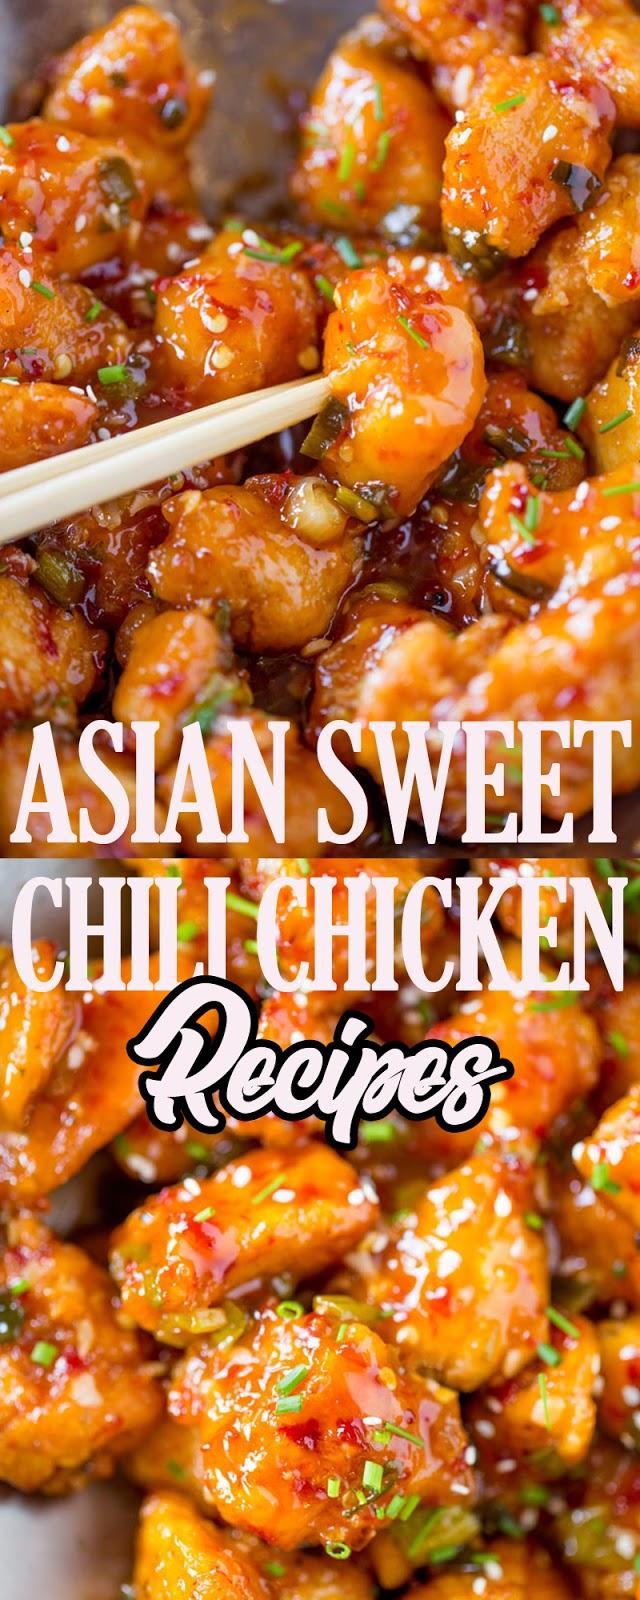 ASIAN SWEET CHILI CHICKEN